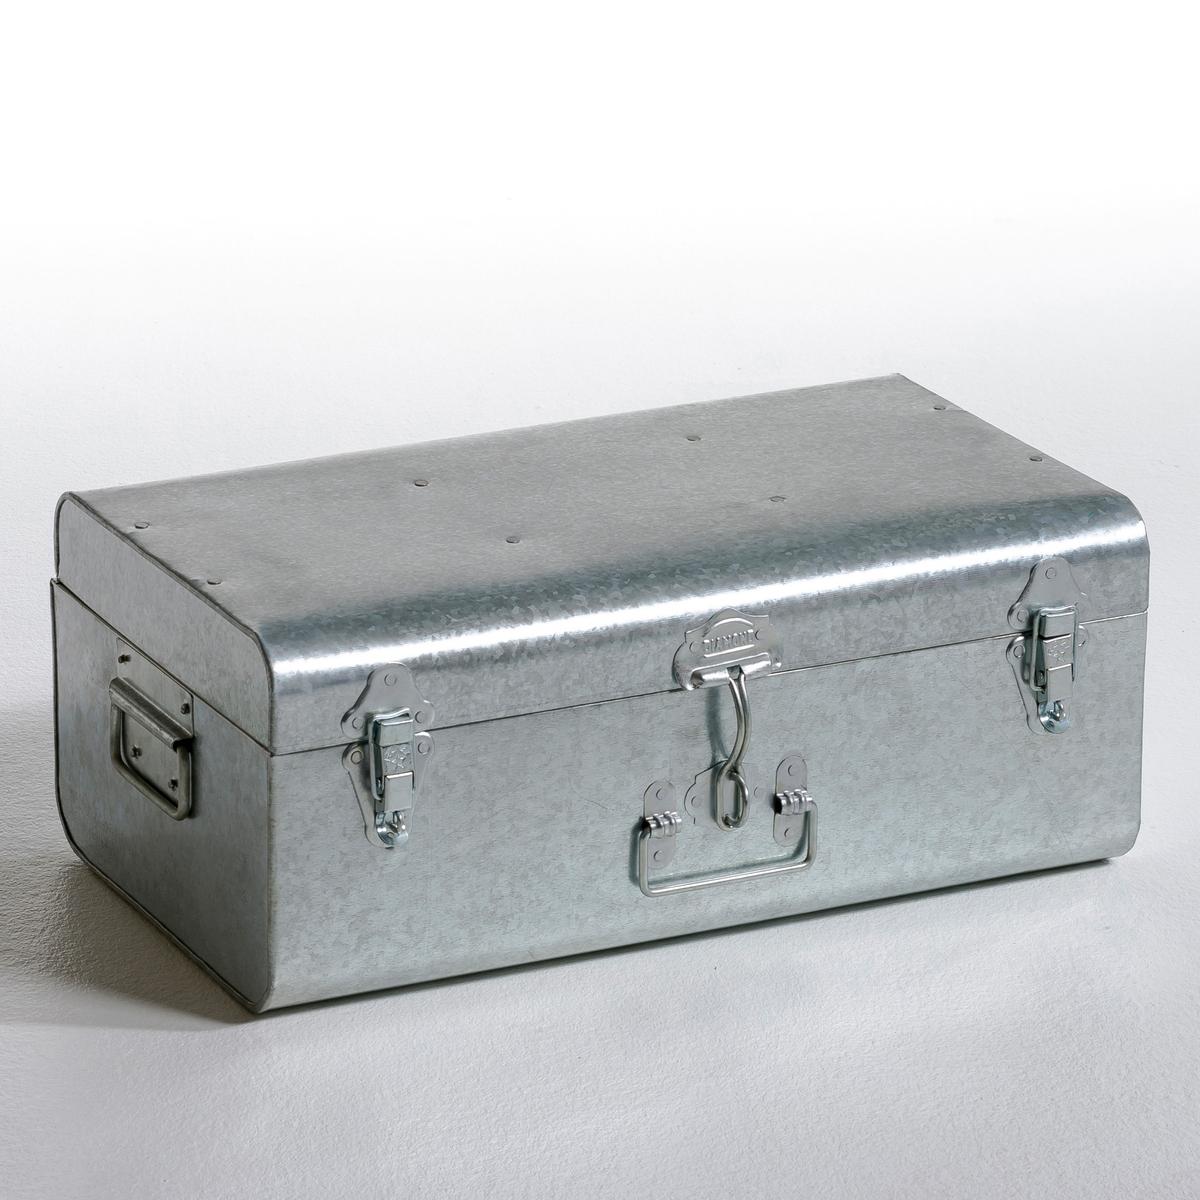 Сундук металлический Denise короб для хранения размер l denise